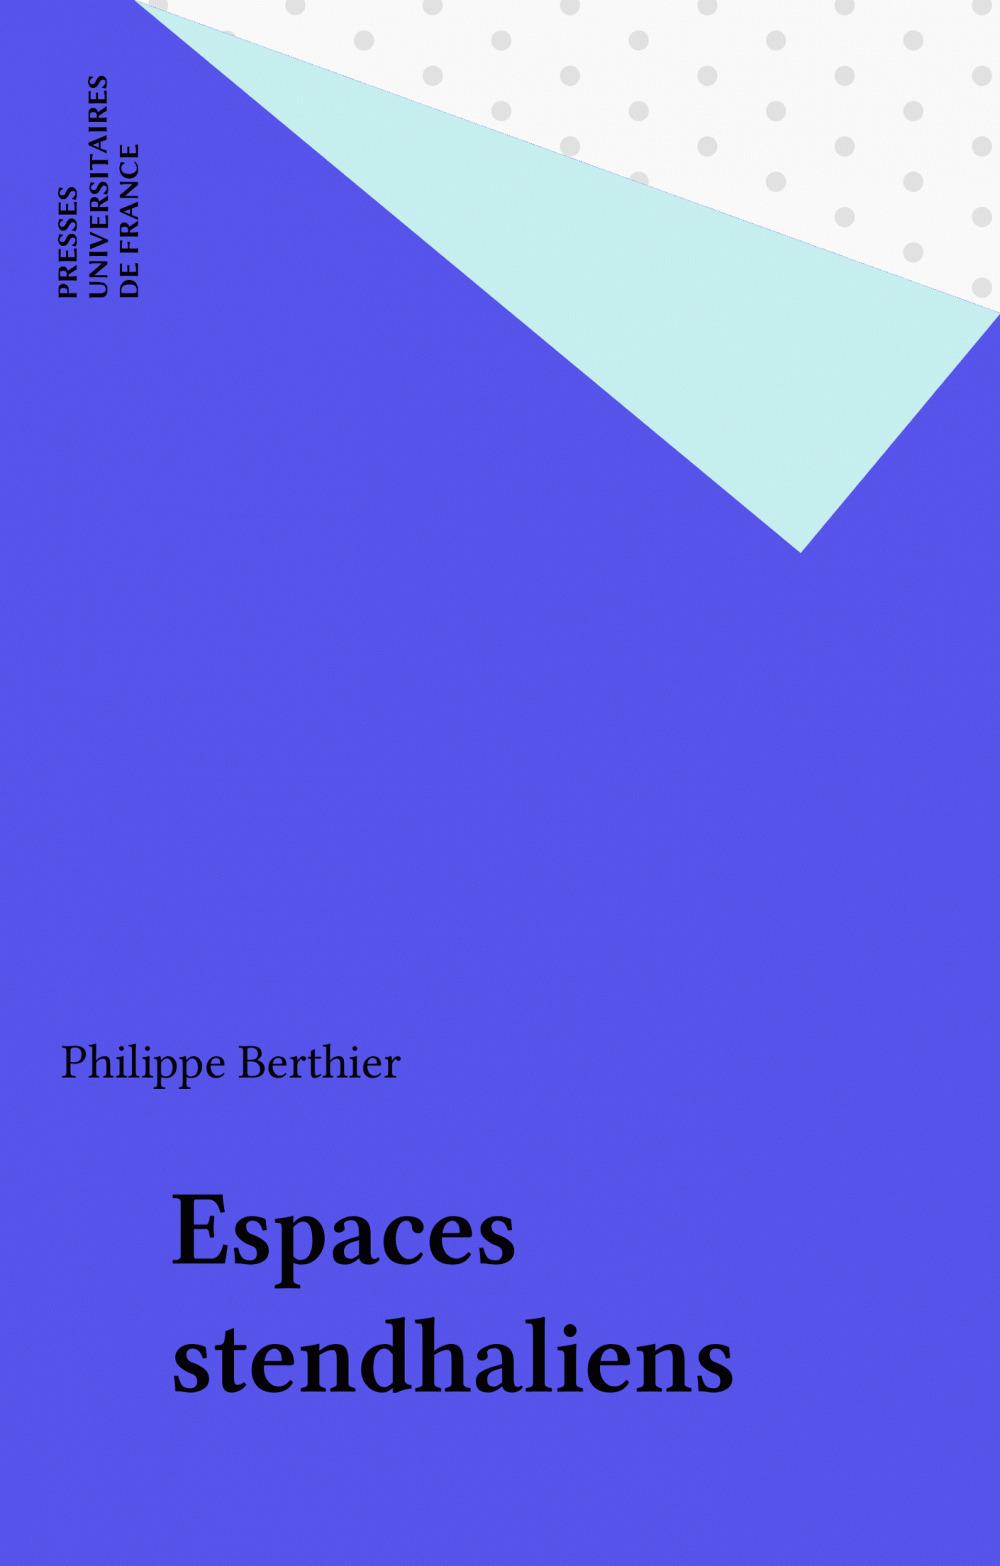 Espaces stendhaliens